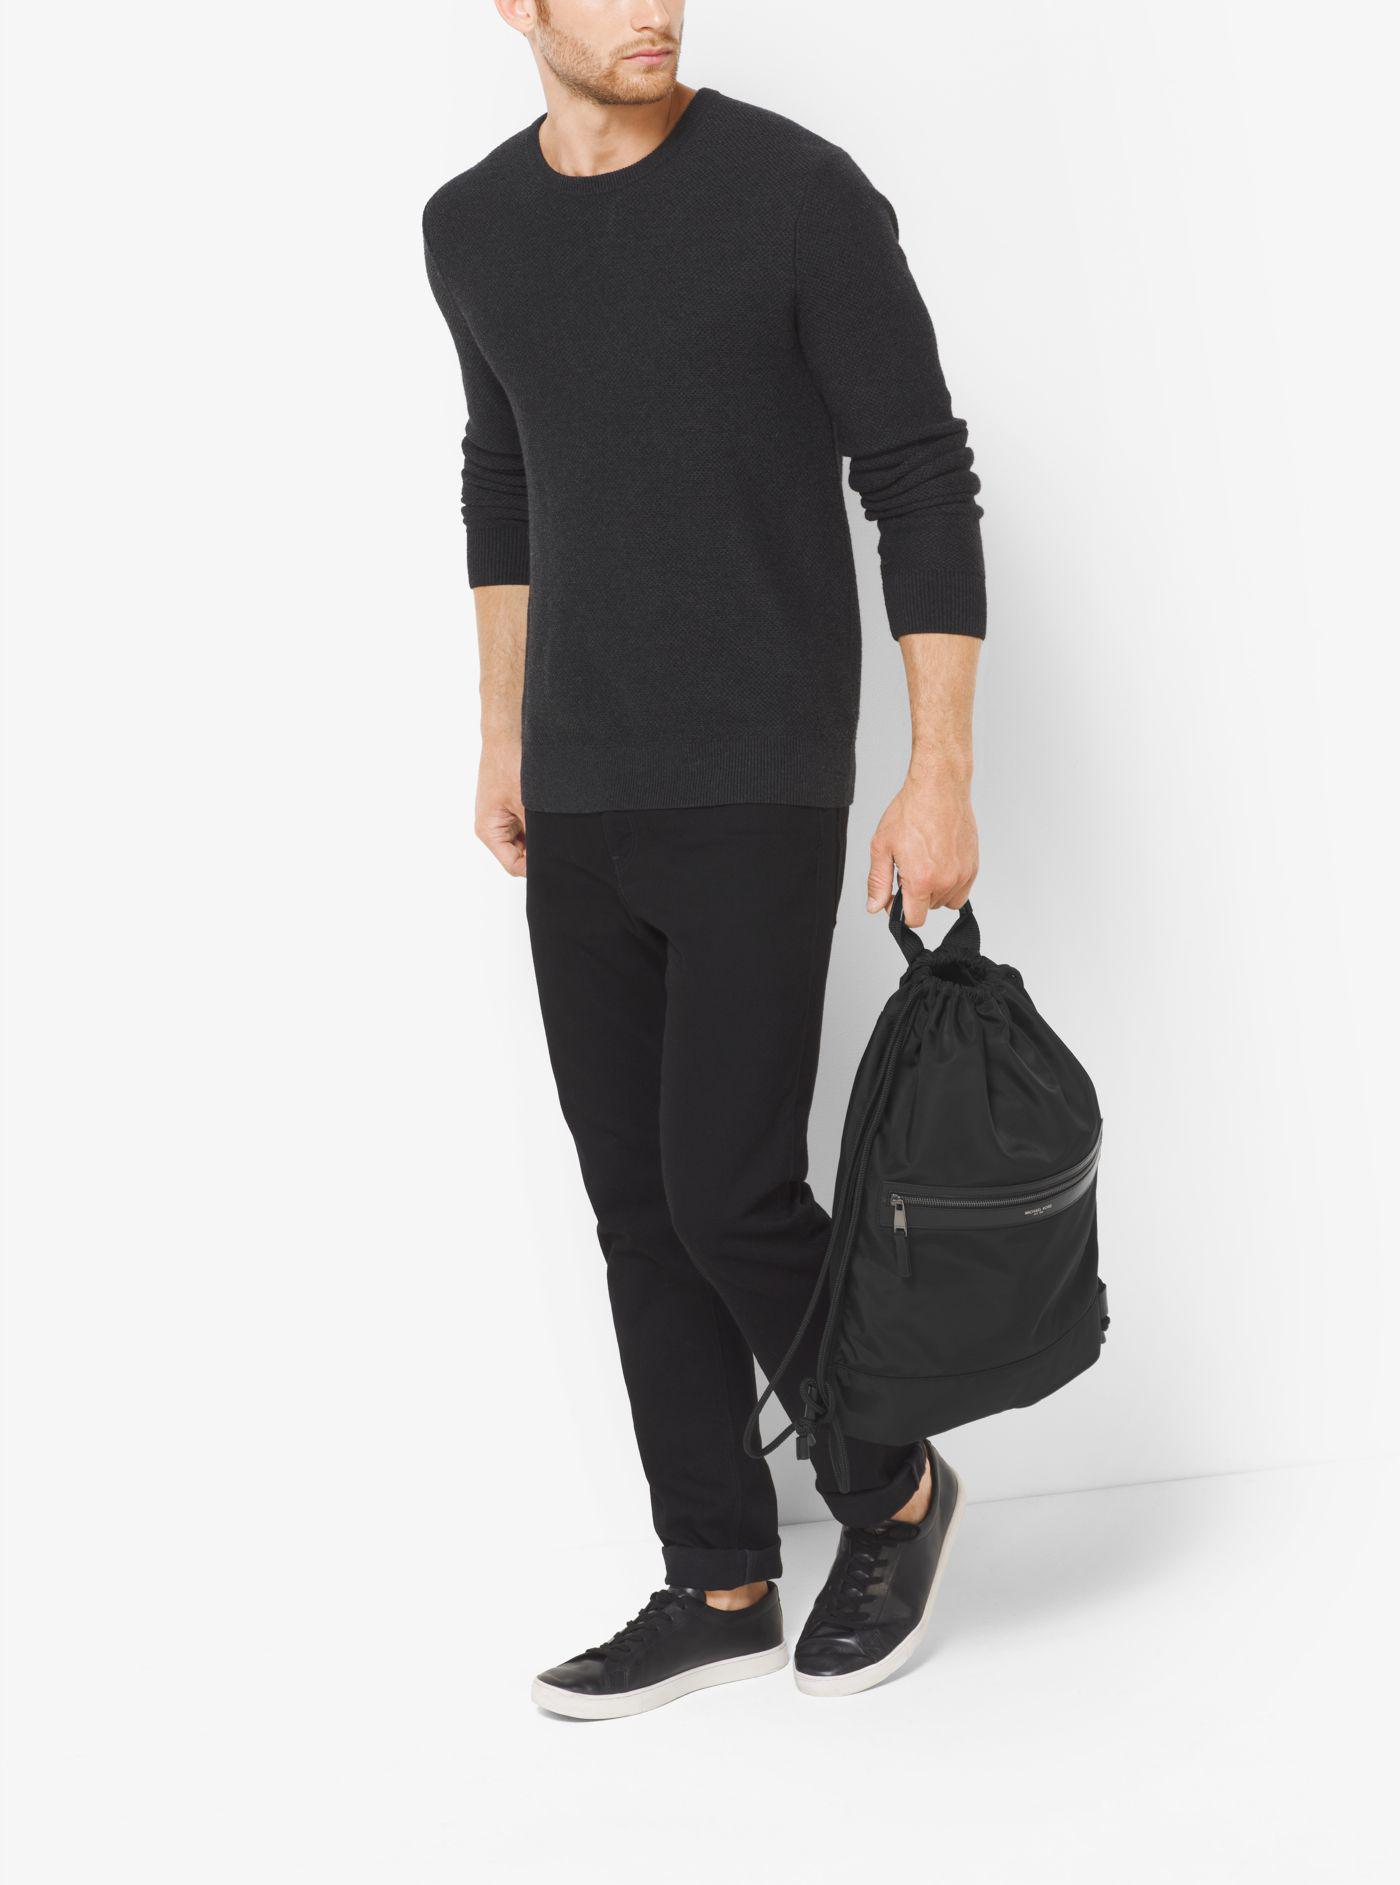 c7757de645 f81afcfb5349 Michael Kors Kent Nylon Drawstring Backpack in Black for Men -  Lyst ...